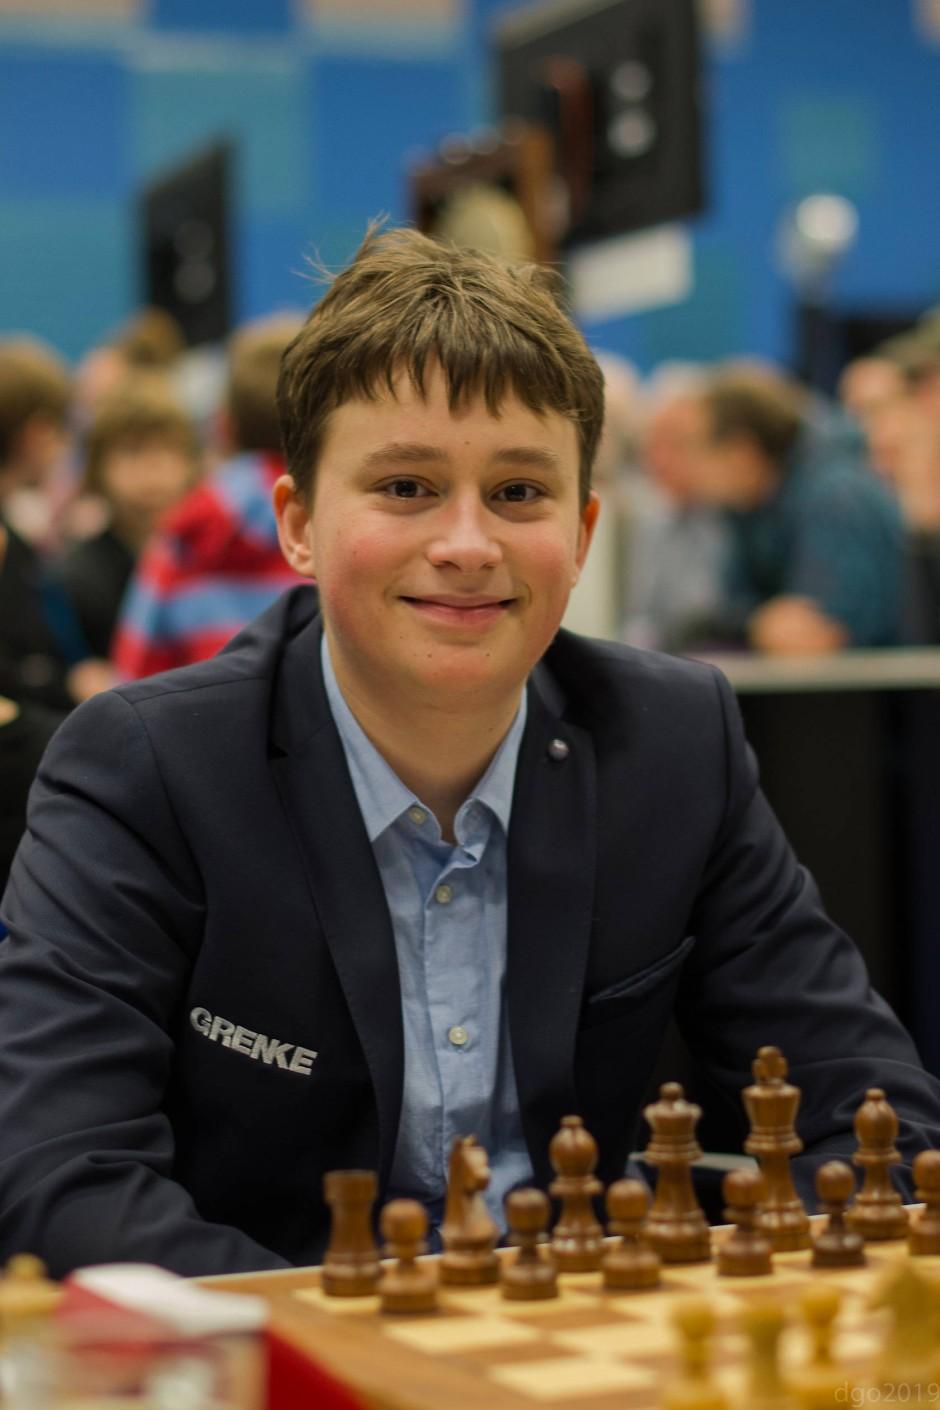 Grenke Schach